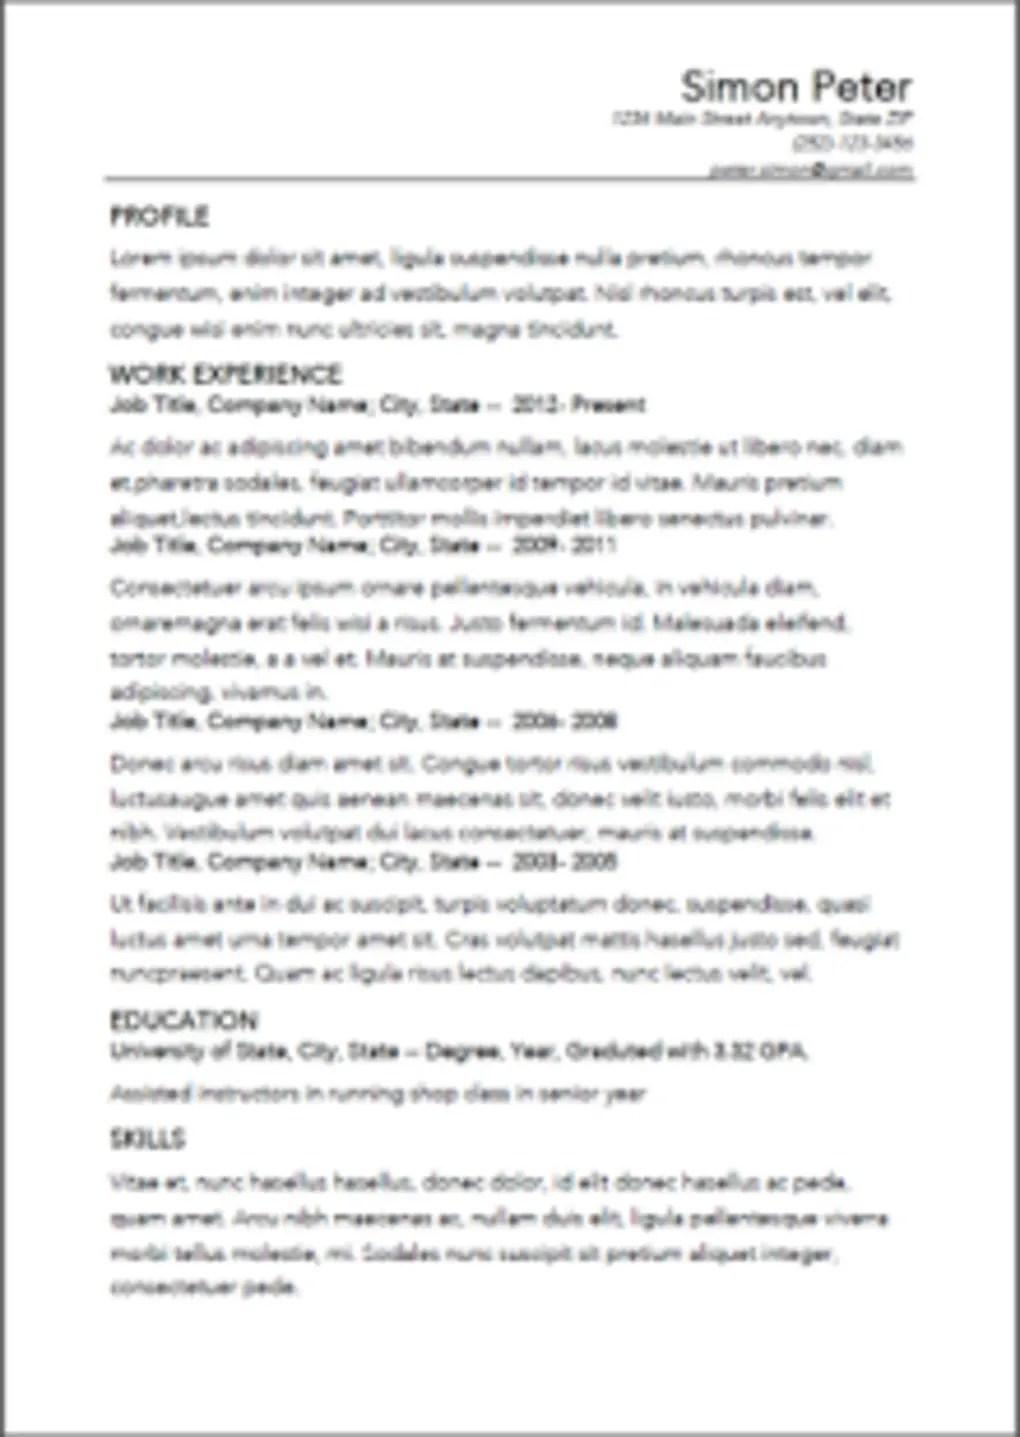 Smart Resume Builder CV Free For Android Download